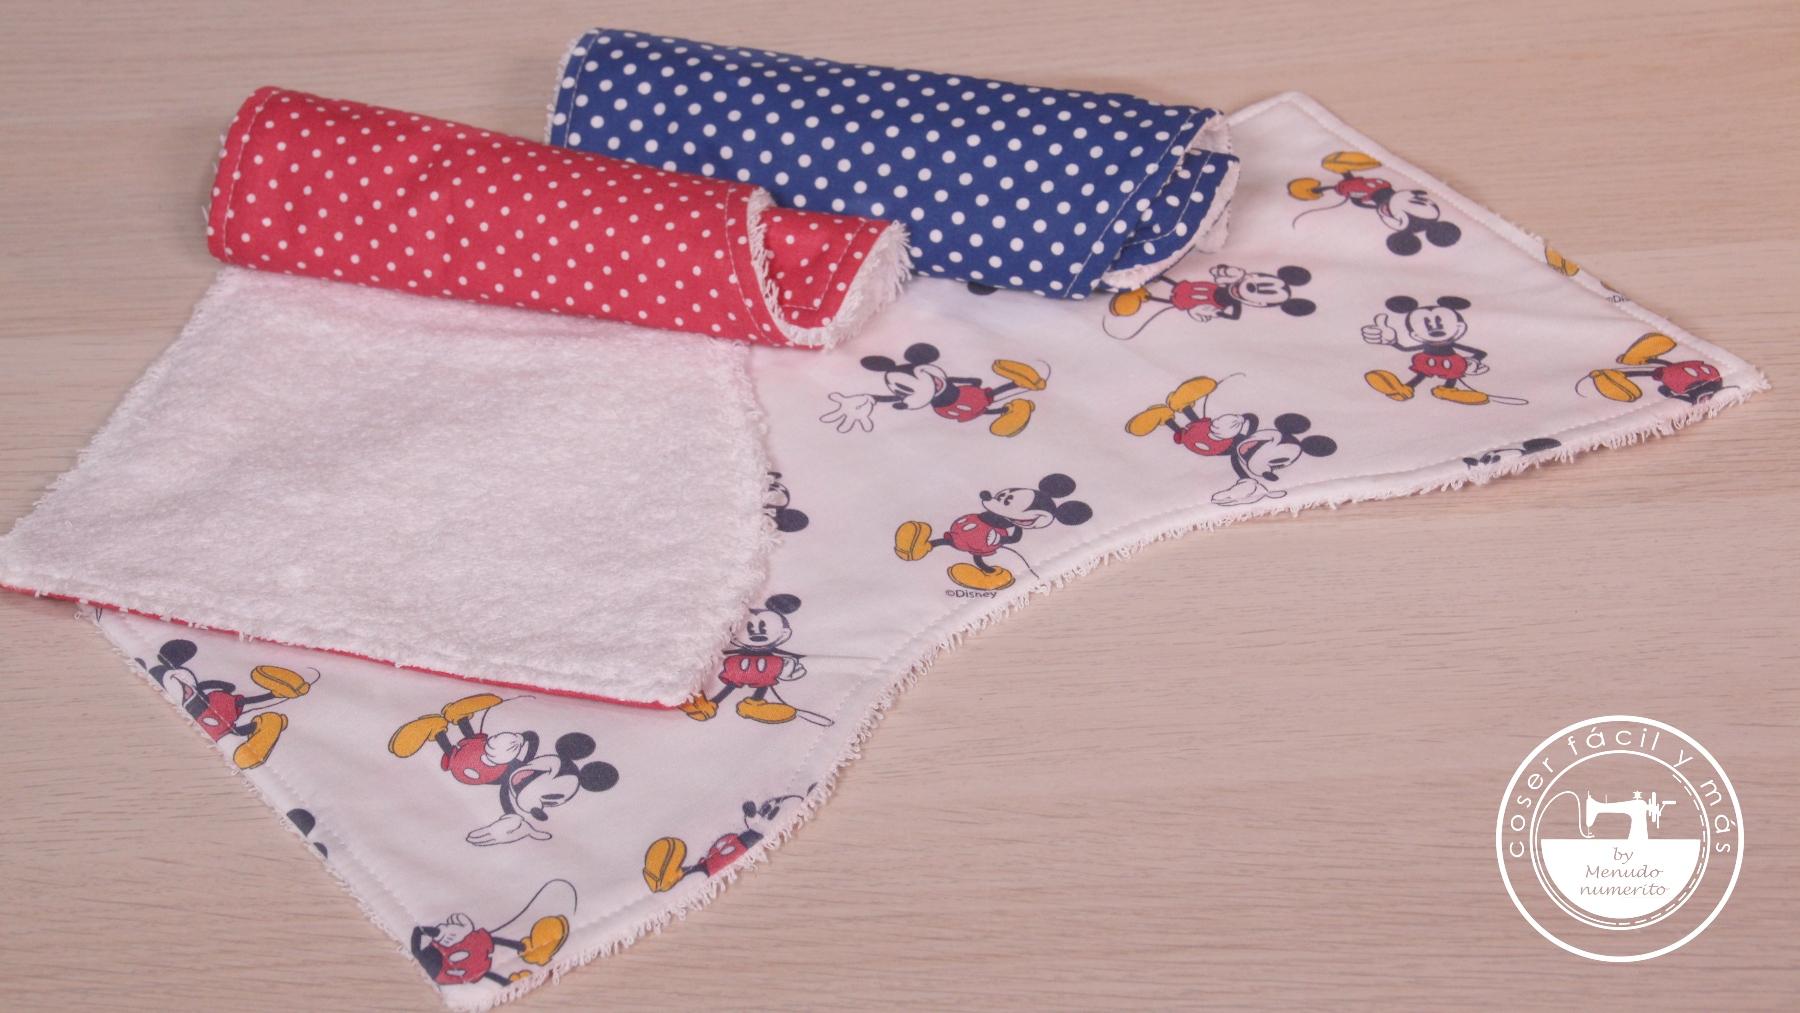 toallas de lactancia baberos menudo numerito blogs de costura